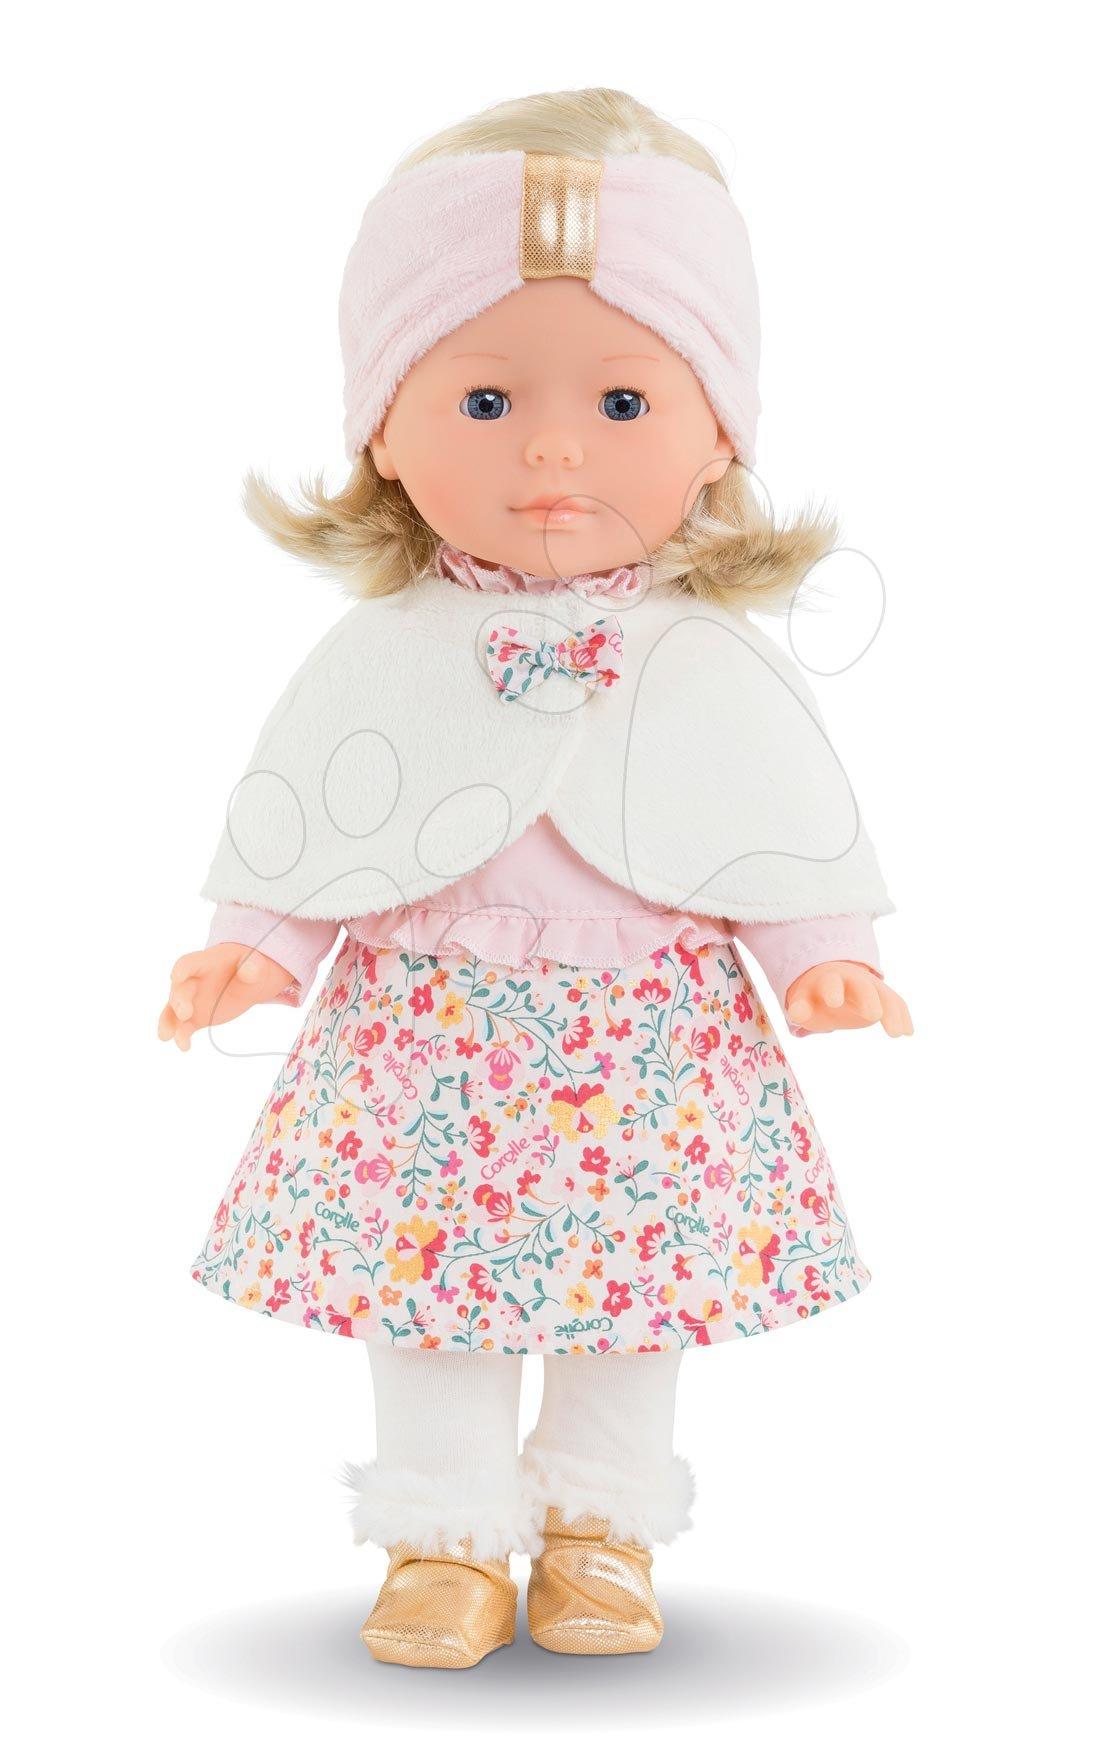 Panenky od 4 let - Panenka s pelerínou Ma Corolle Priscille Blossom Winter Corolle s modrýma očima 36 cm – limitovaná edice od 4 let